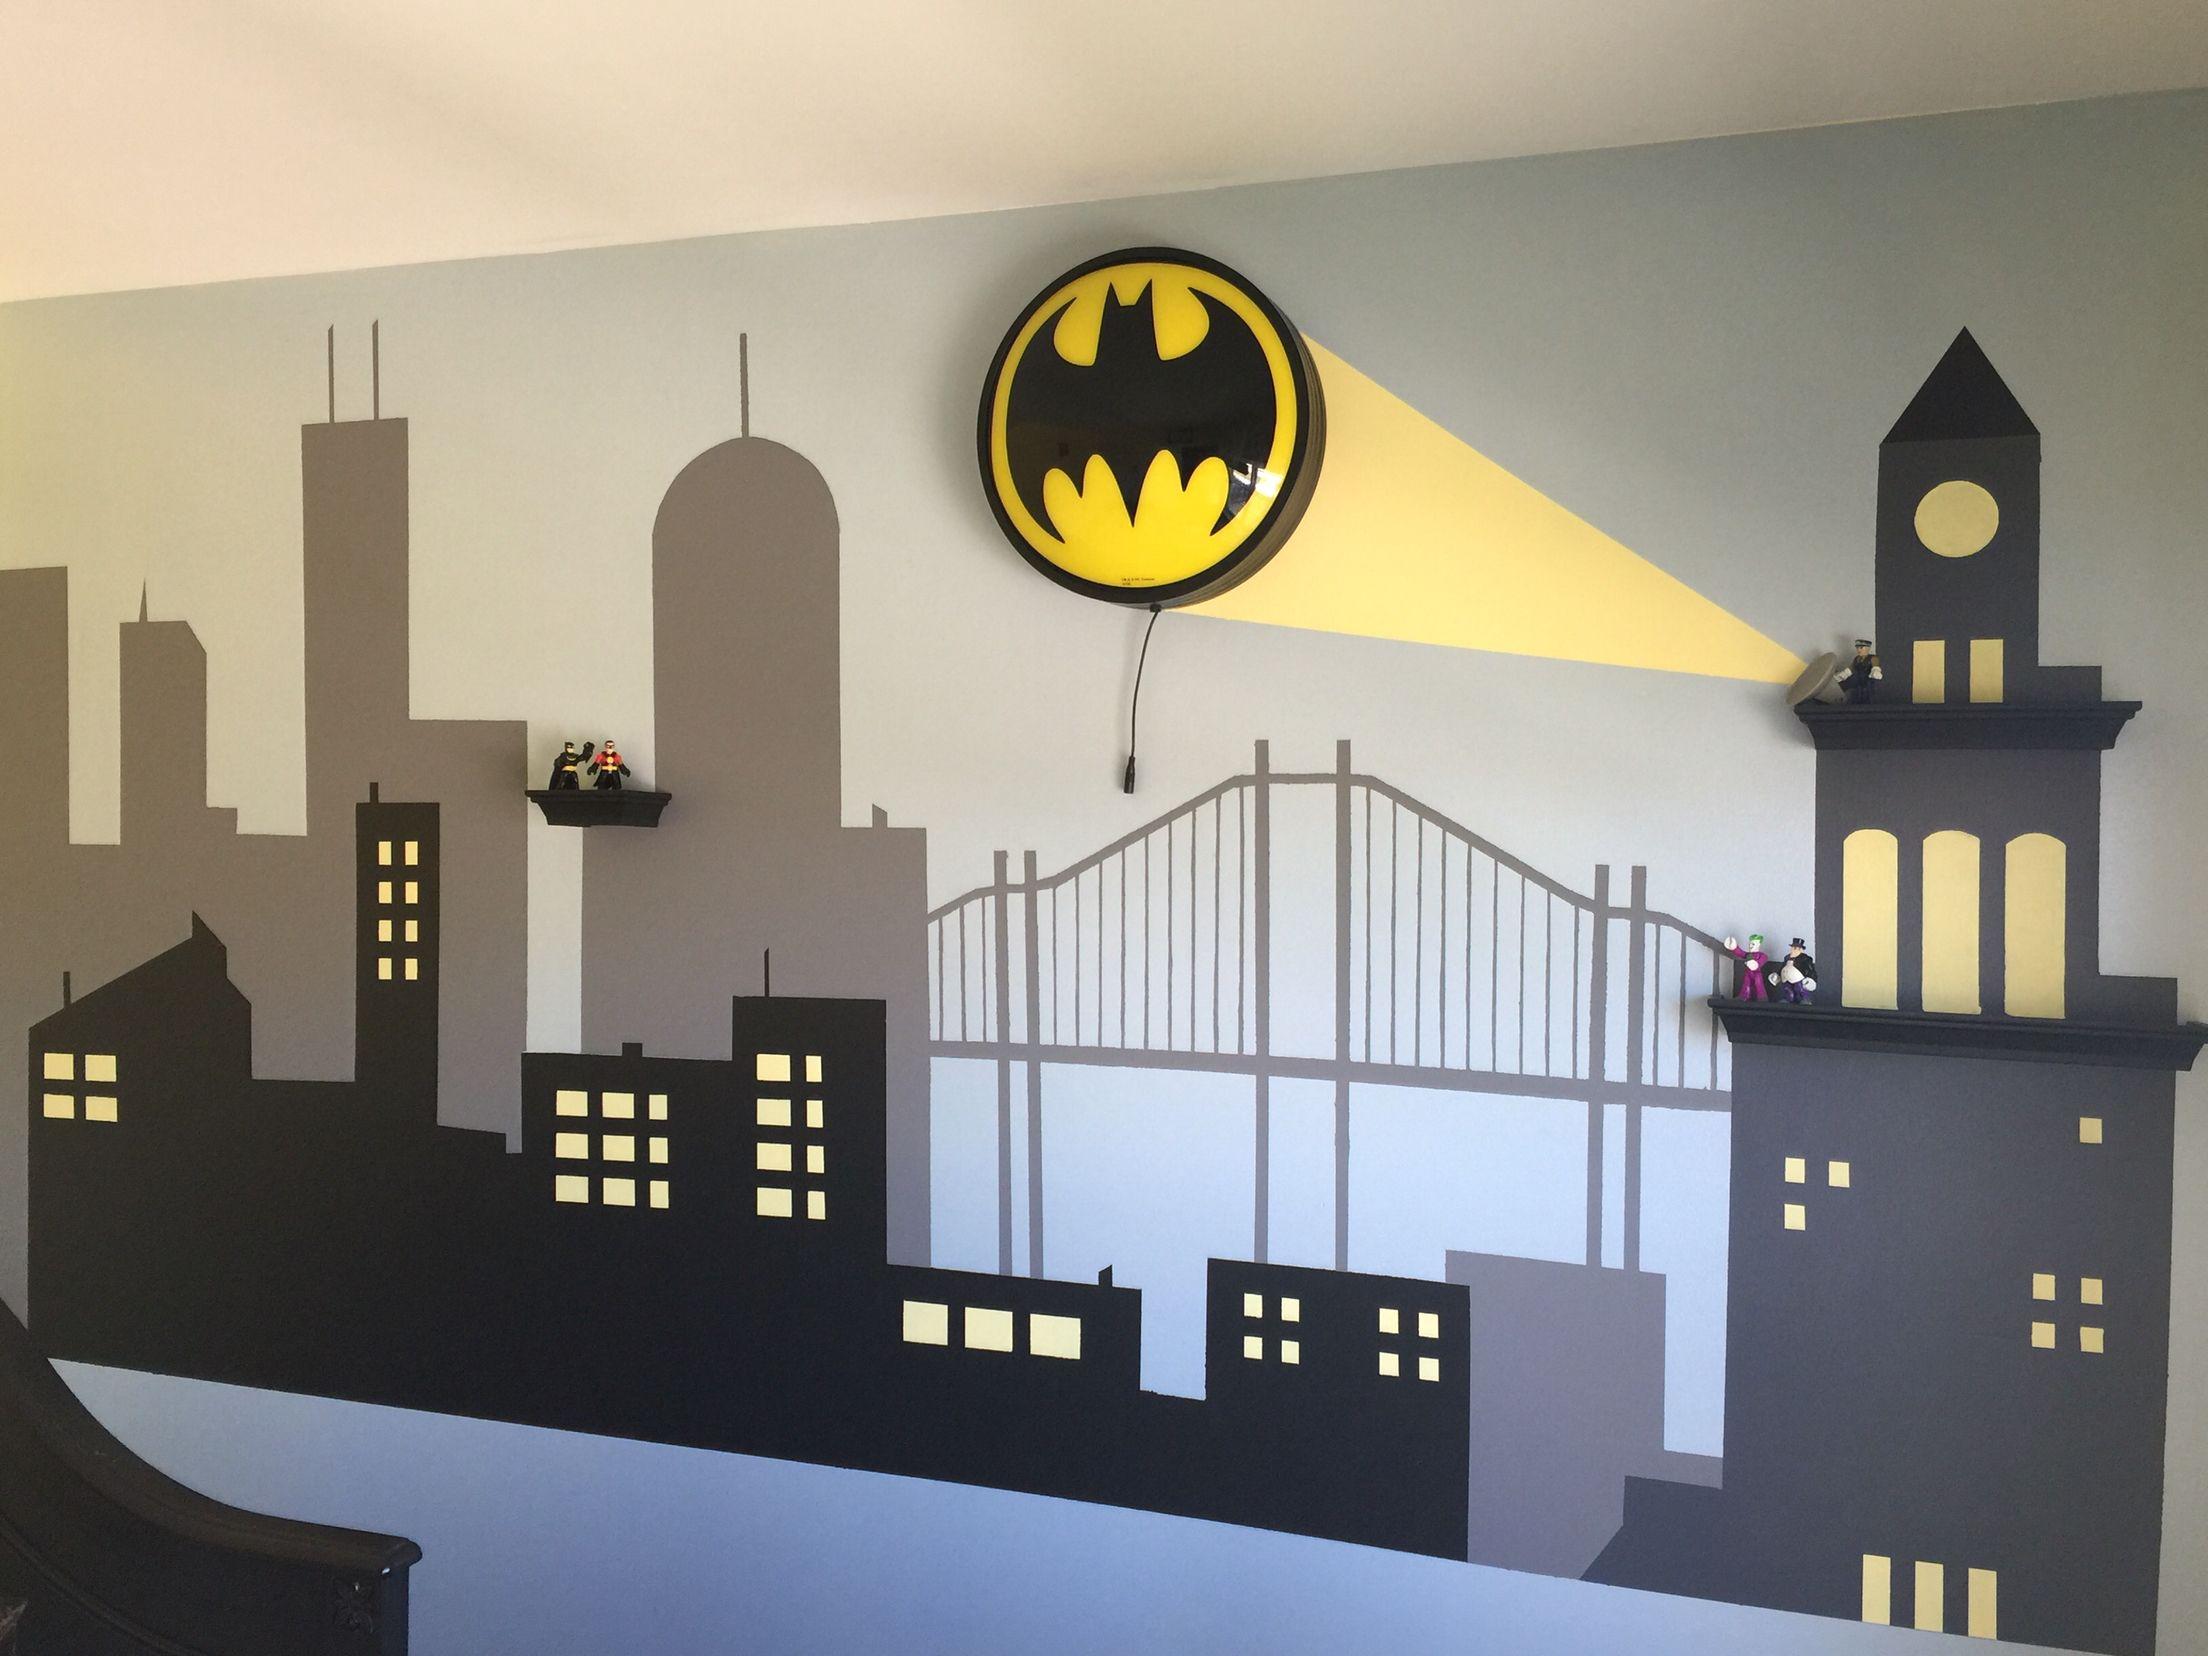 Batman Kinderzimmer ~ Gotham city batman bedroom diy surprise for my son! : my #diy